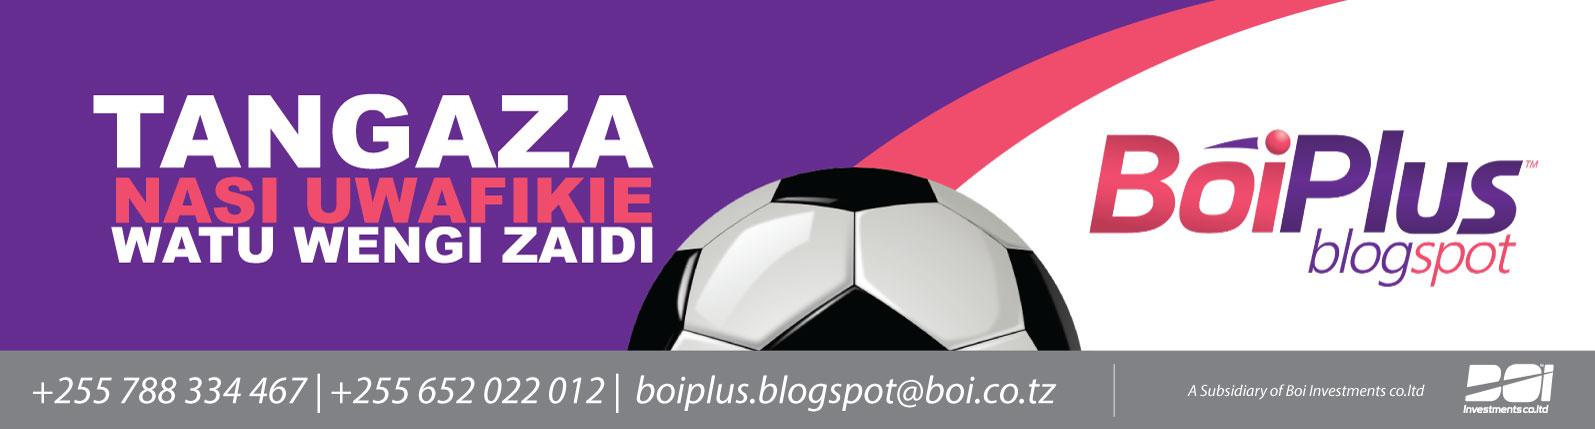 BOIPLUS Blogspot